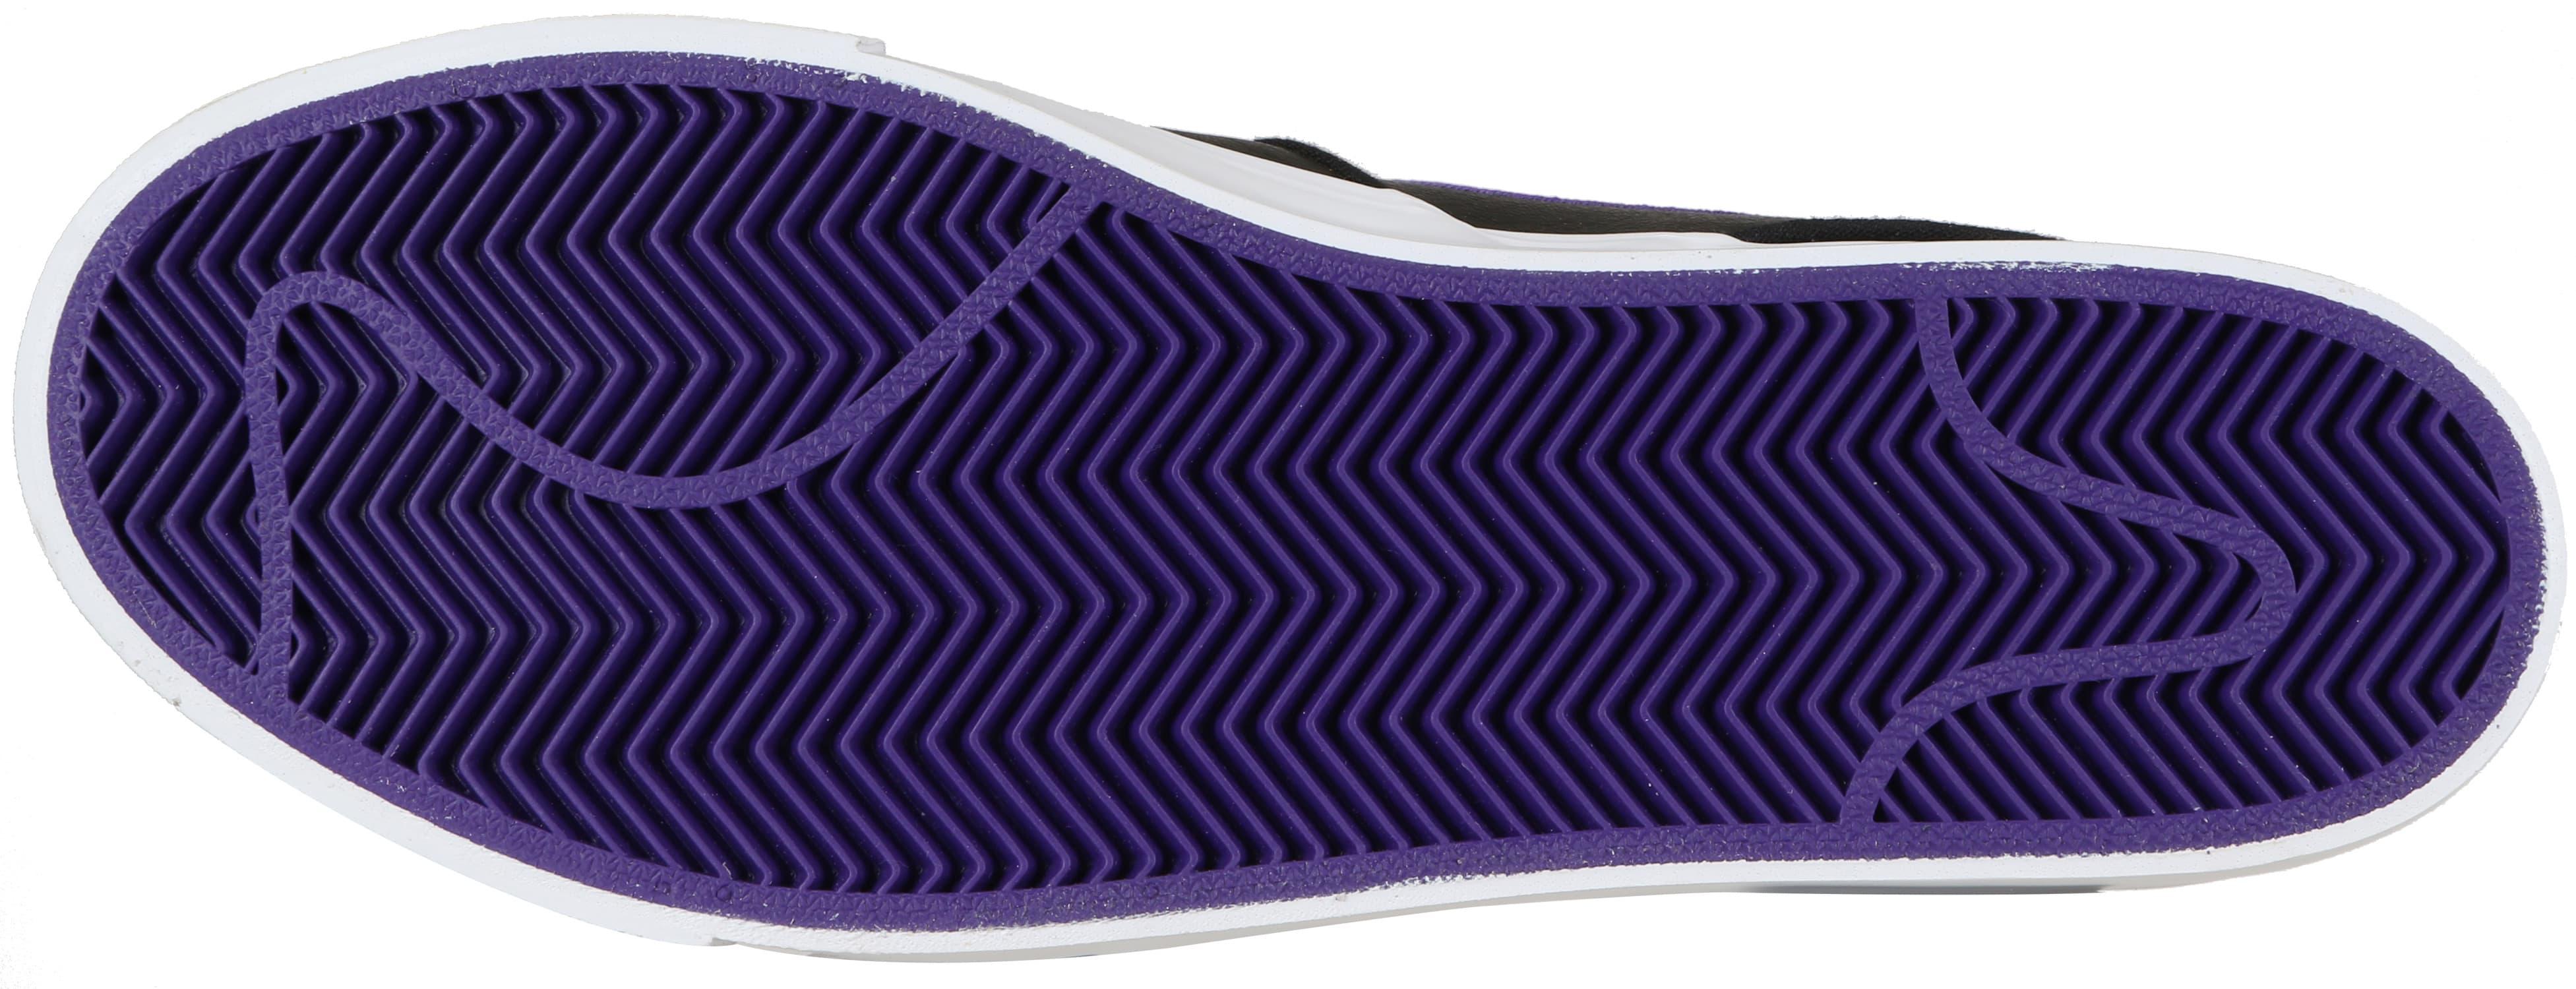 da8adfab5ee Nike SB Zoom Stefan Janoski NBA Slip Skate Shoes - thumbnail 4